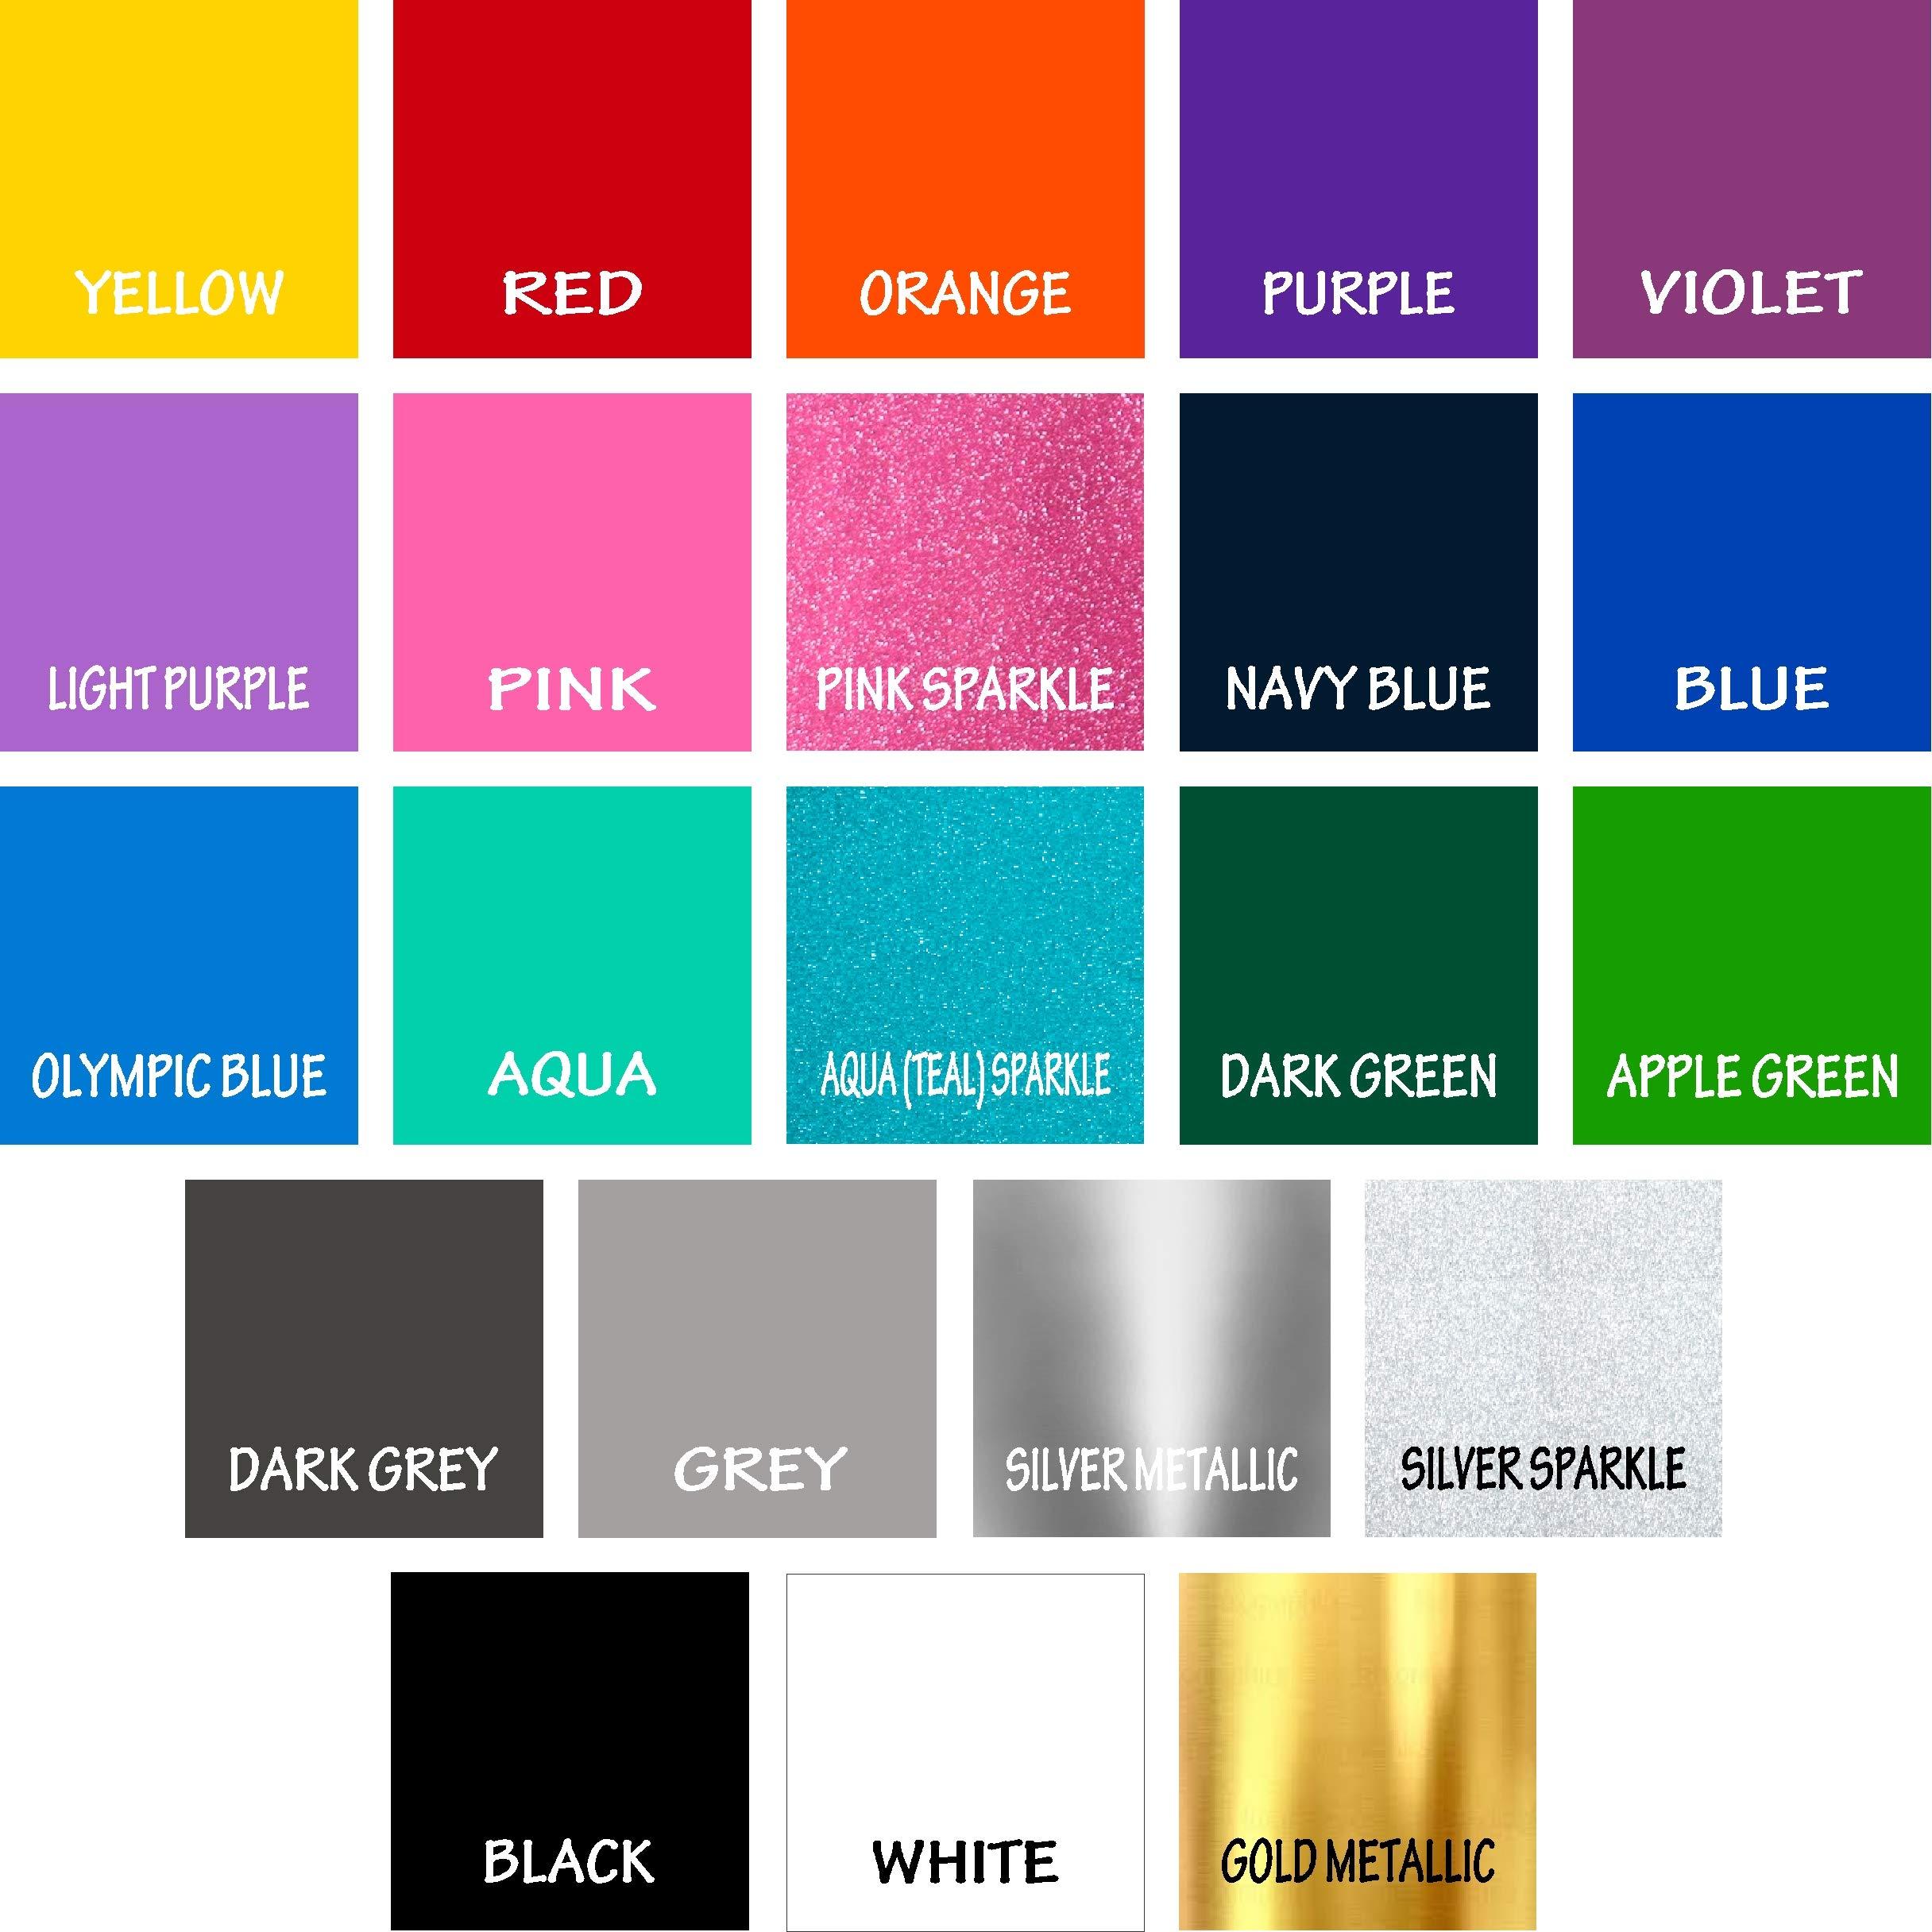 Bermuda Shorts Graphics Personalized Name Decal/Tumbler Sticker/Custom Vinyl Laptop Skin Decal Sticker (2'' x 4'' Decal)